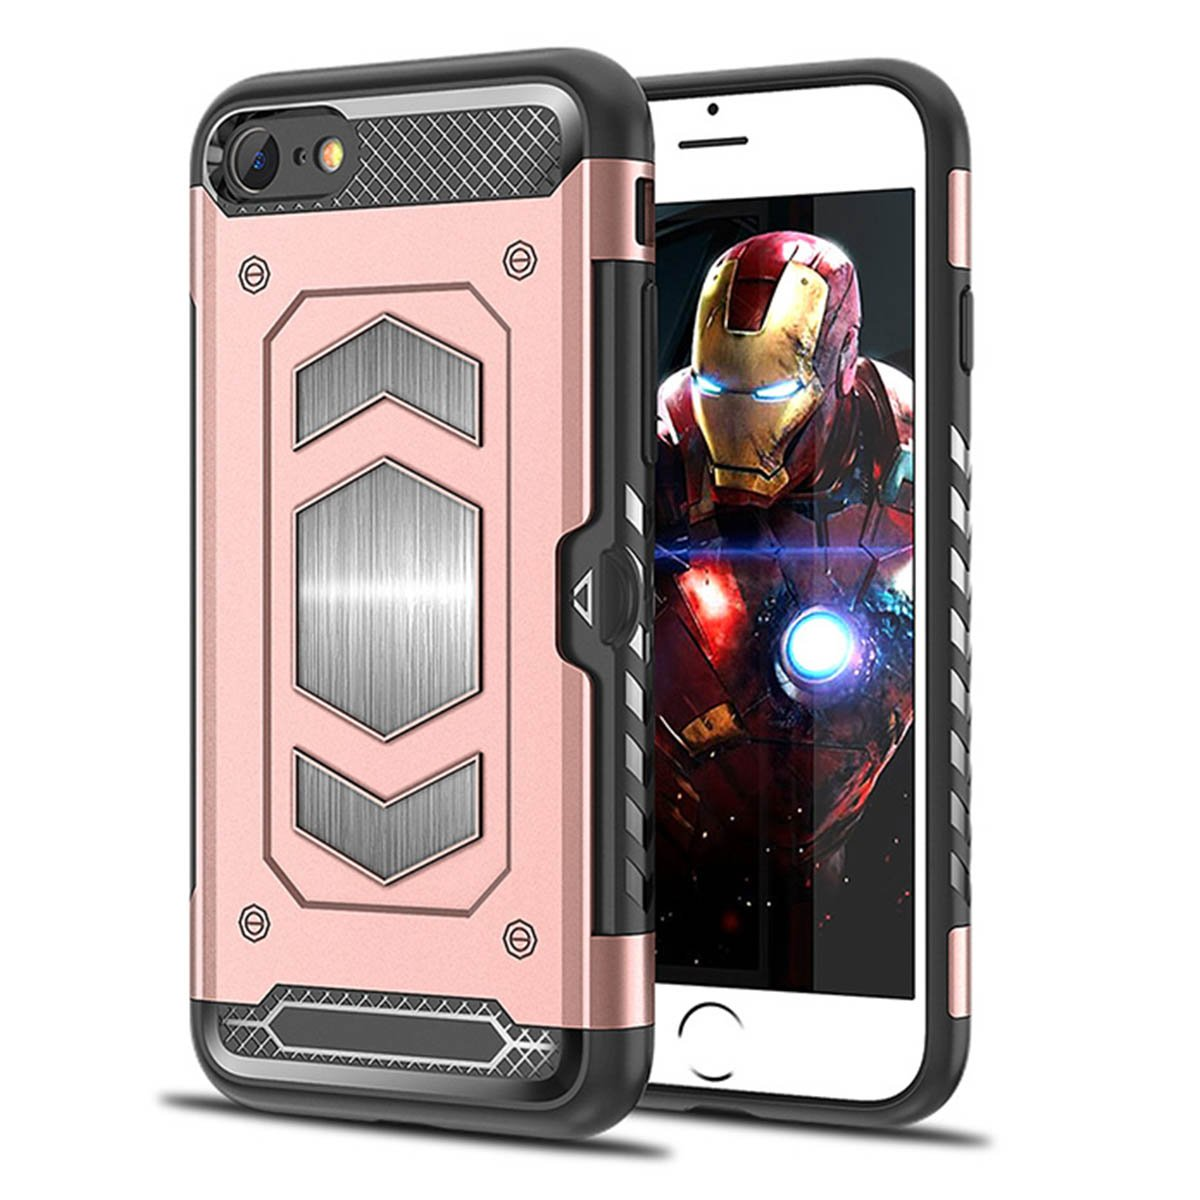 Hy series-heima Extreme耐衝撃頑丈保護ケースカードホルダー&メタルプレートマグネット車用マウントIphone 7 /8 (4.7インチ) iPhone 7/8 (4.7 inch) HYI78-US-Rose Gold iPhone 7/8 (4.7 inch) Rose Gold-HY Series B07D3KQDTG